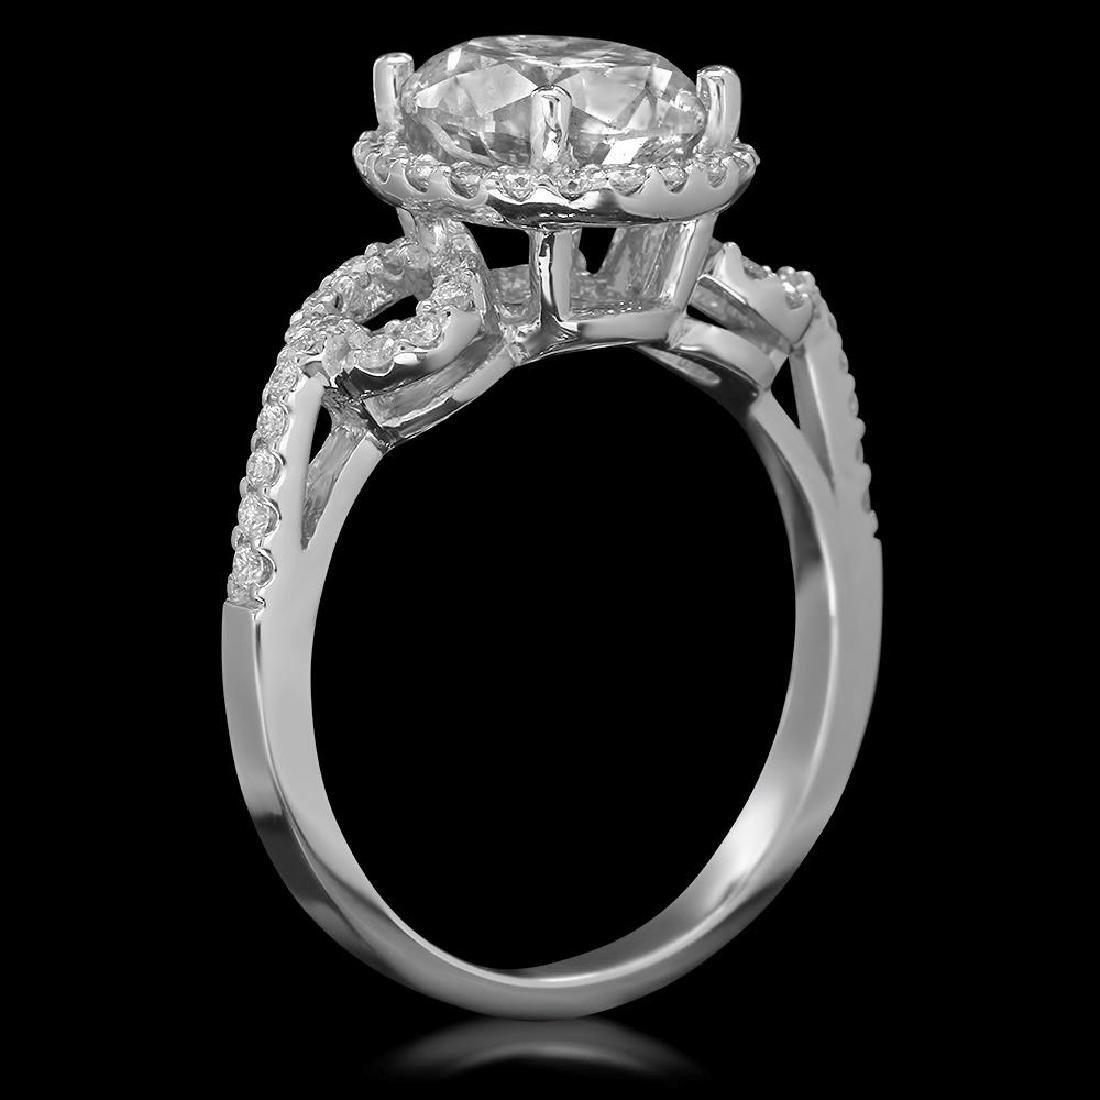 14K Gold 2.73ct Diamond Ring - 2